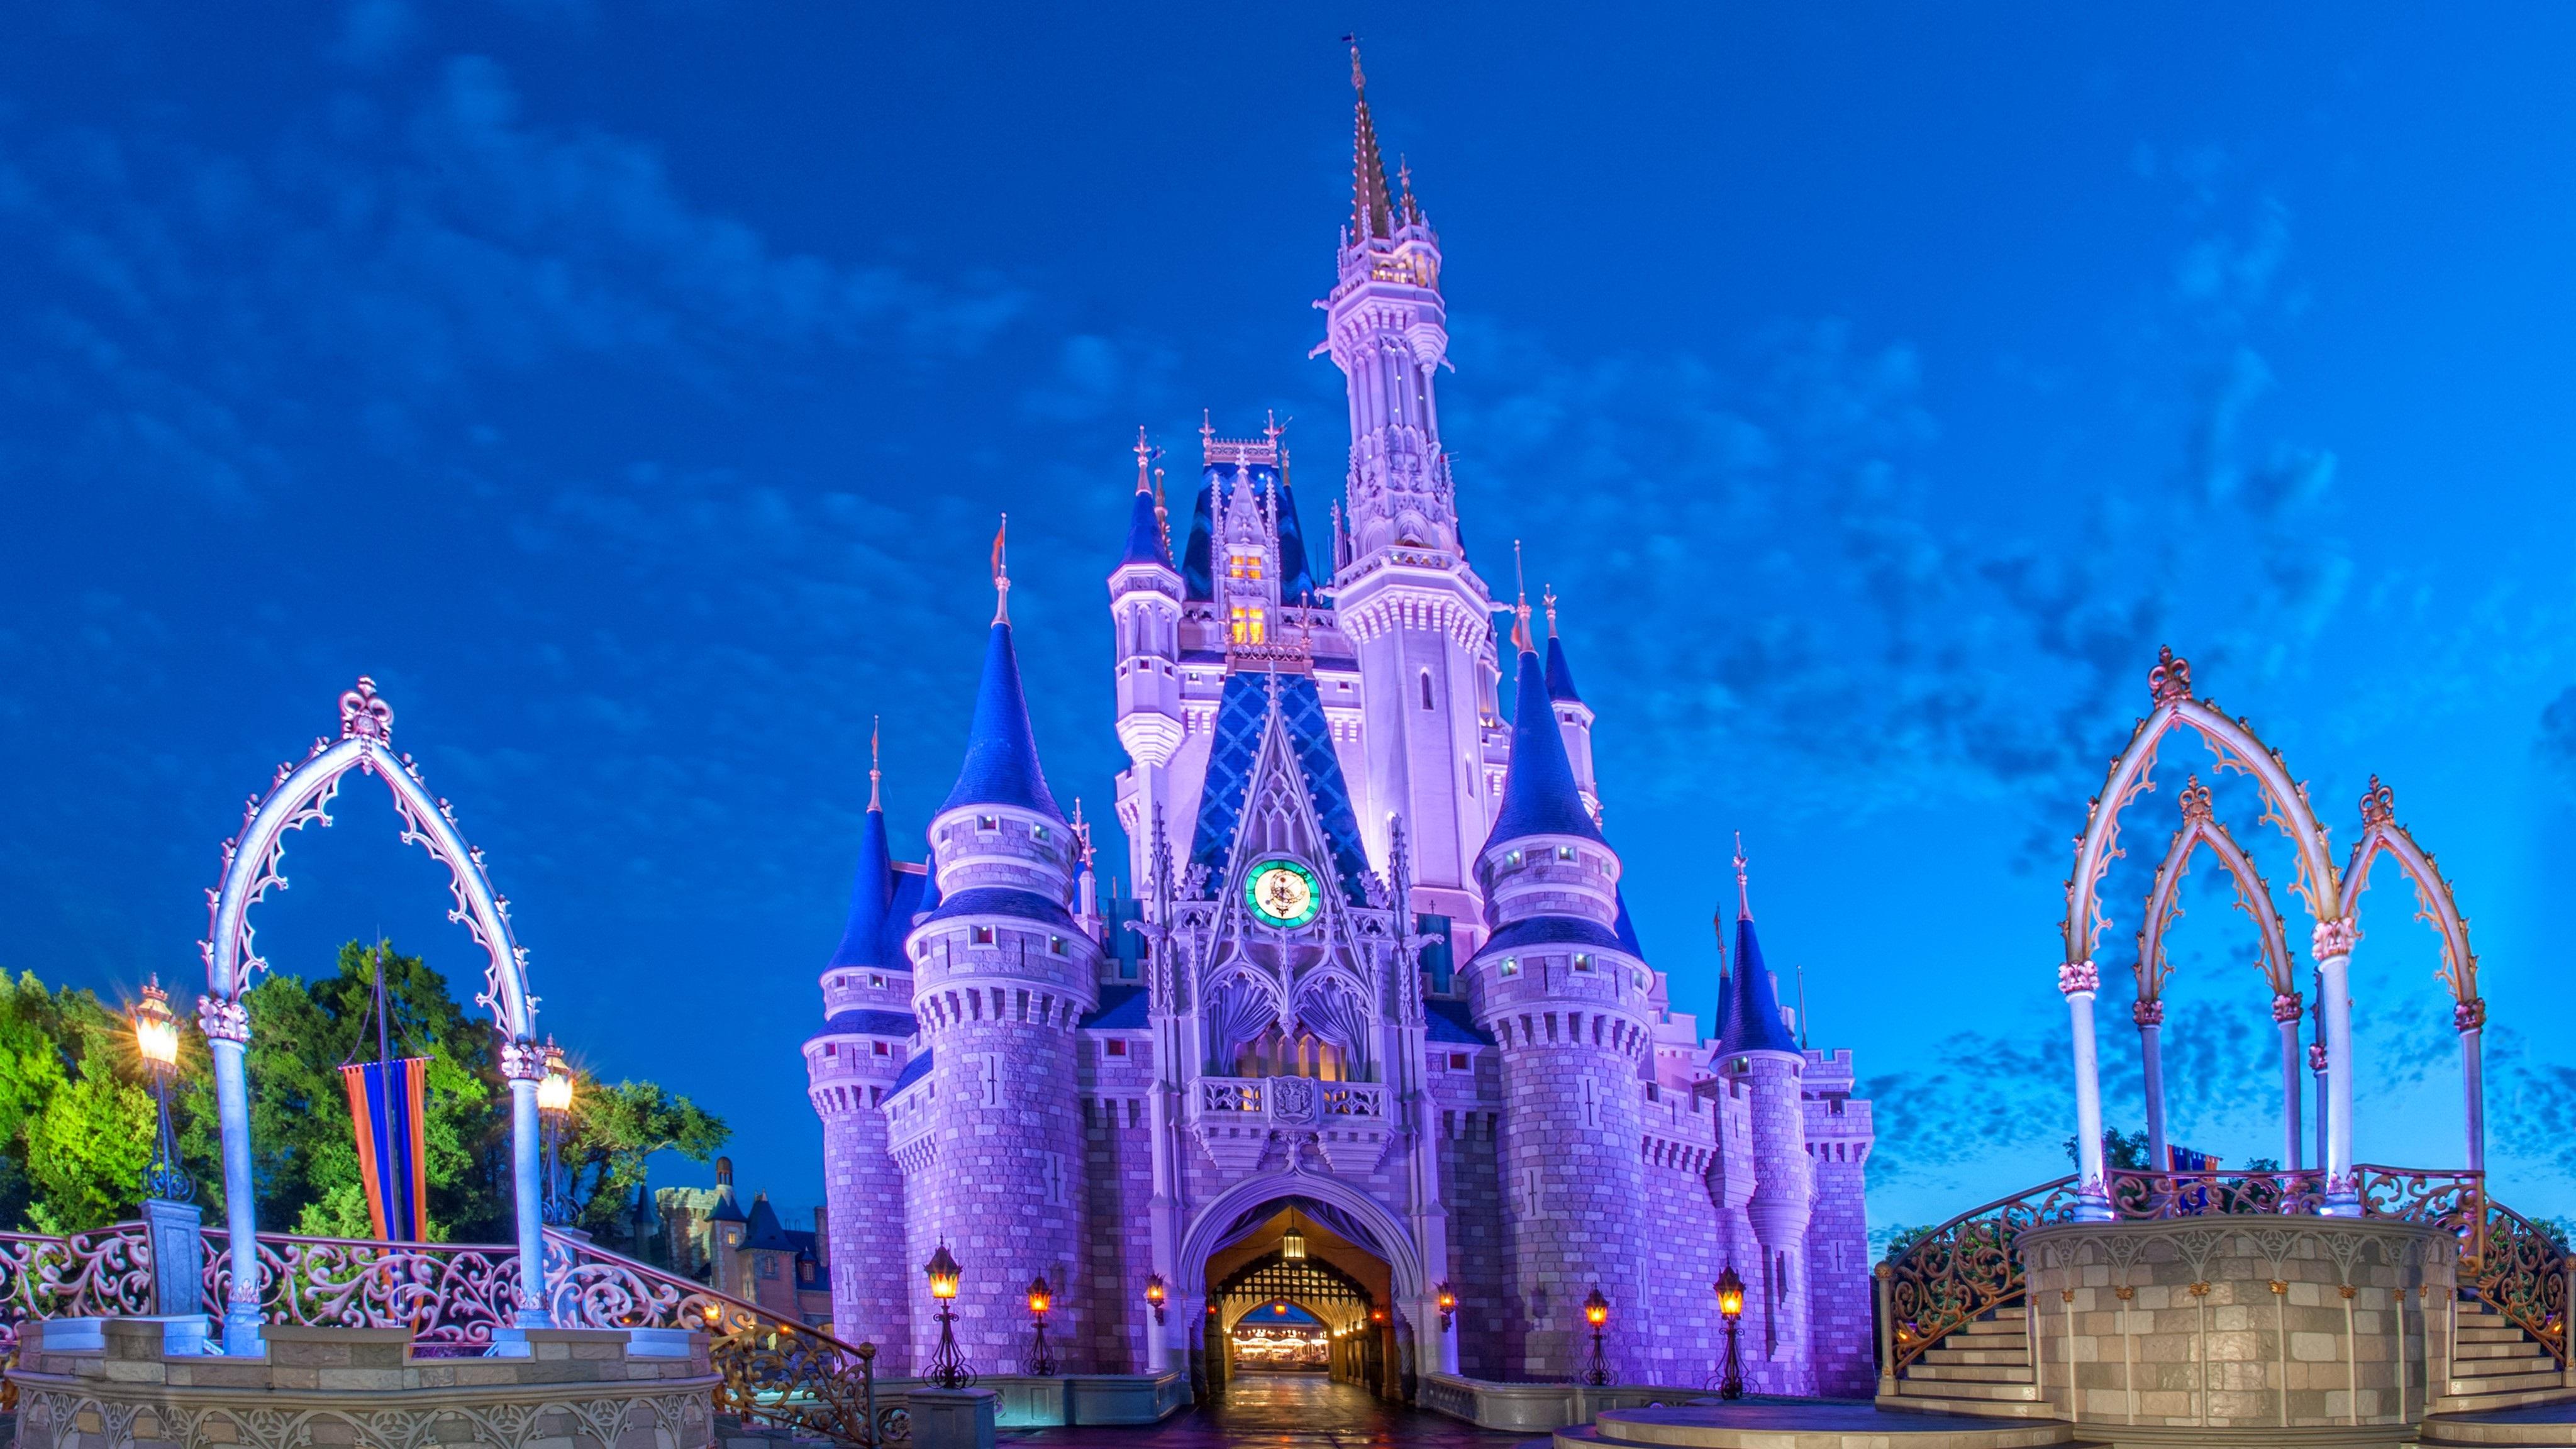 Cinderella Castle At Disney World In Florida 4k Ultra Hd